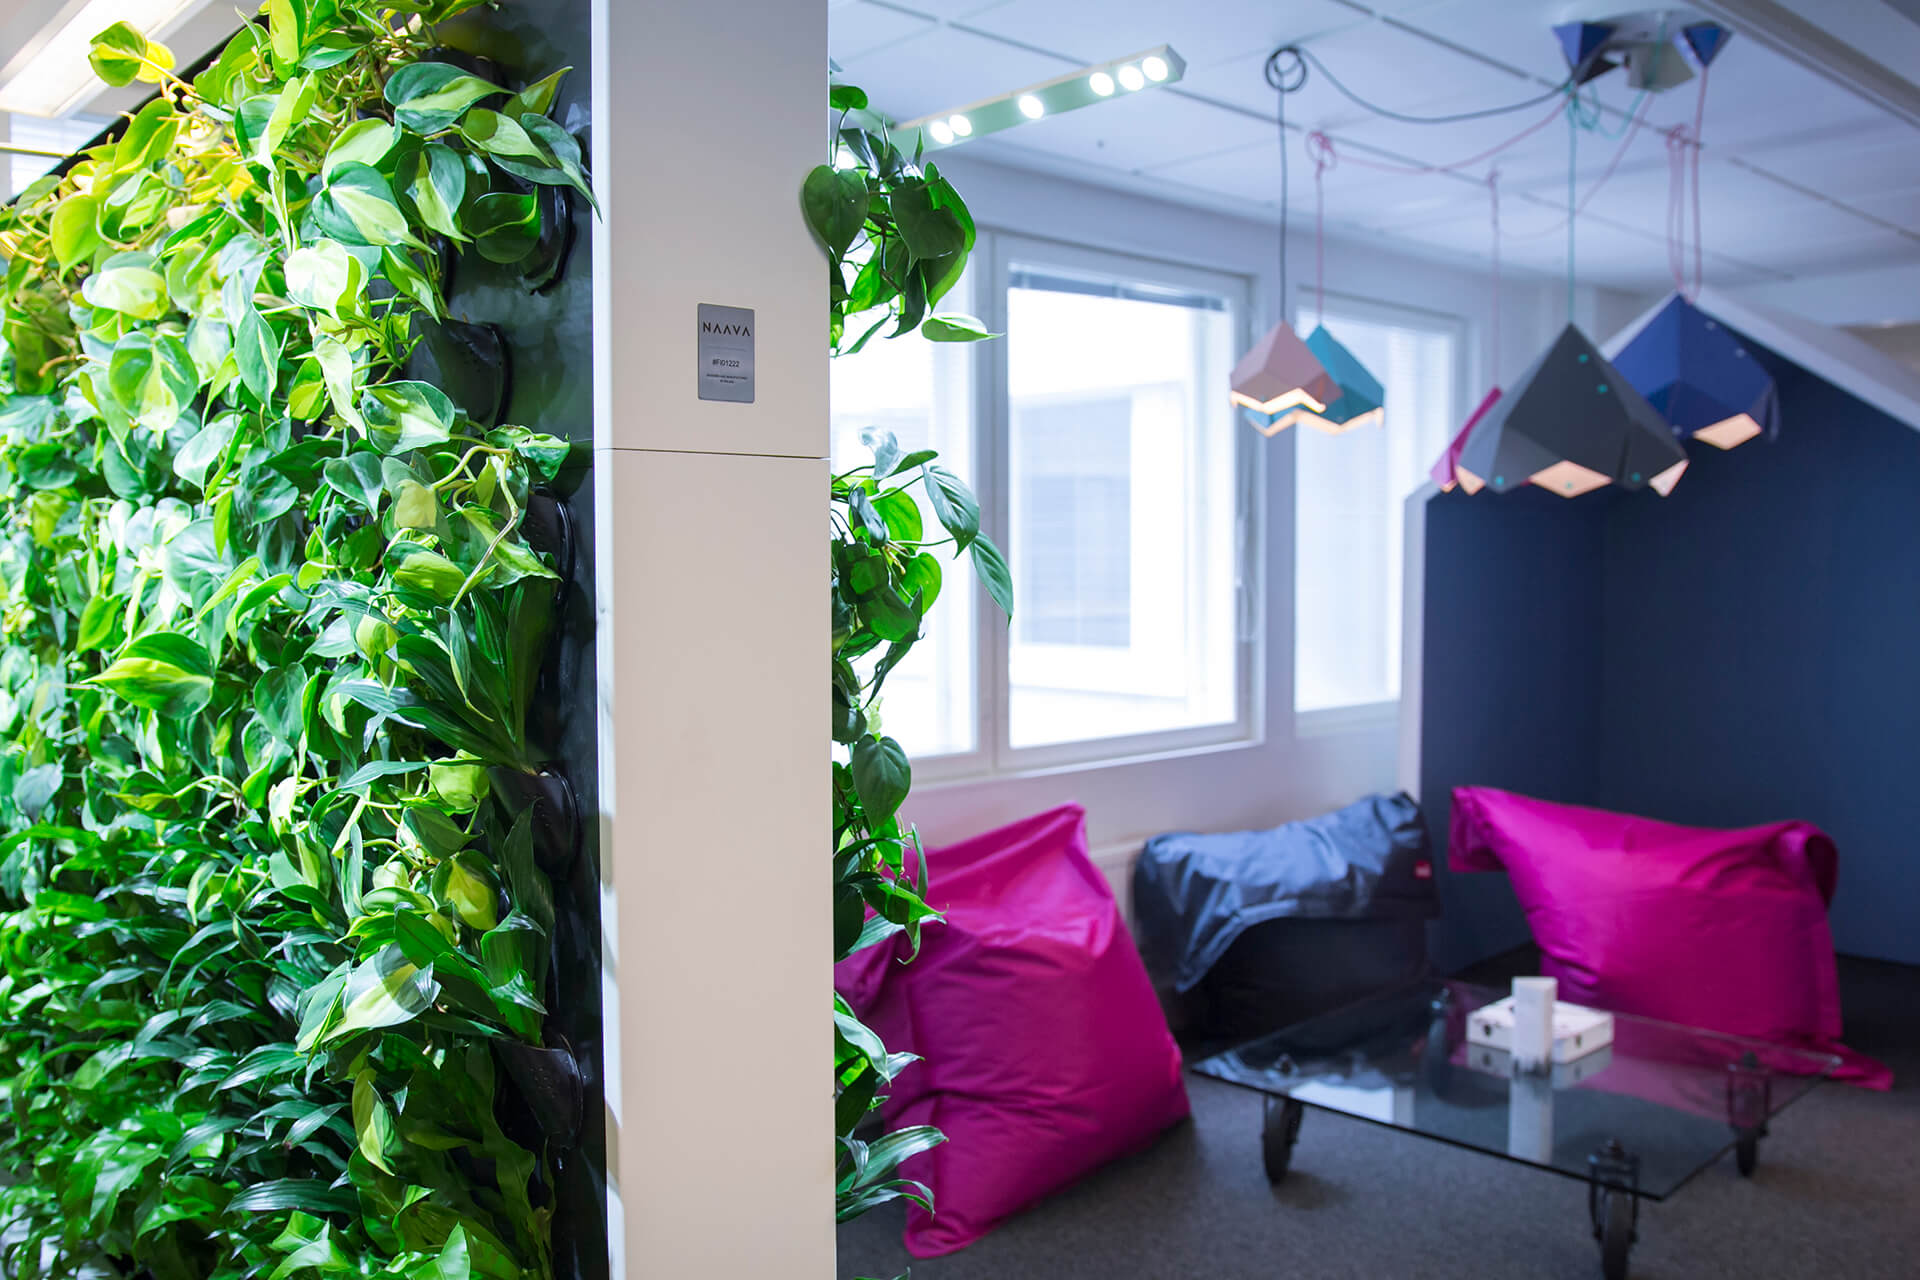 GroupM office - Naava Duo